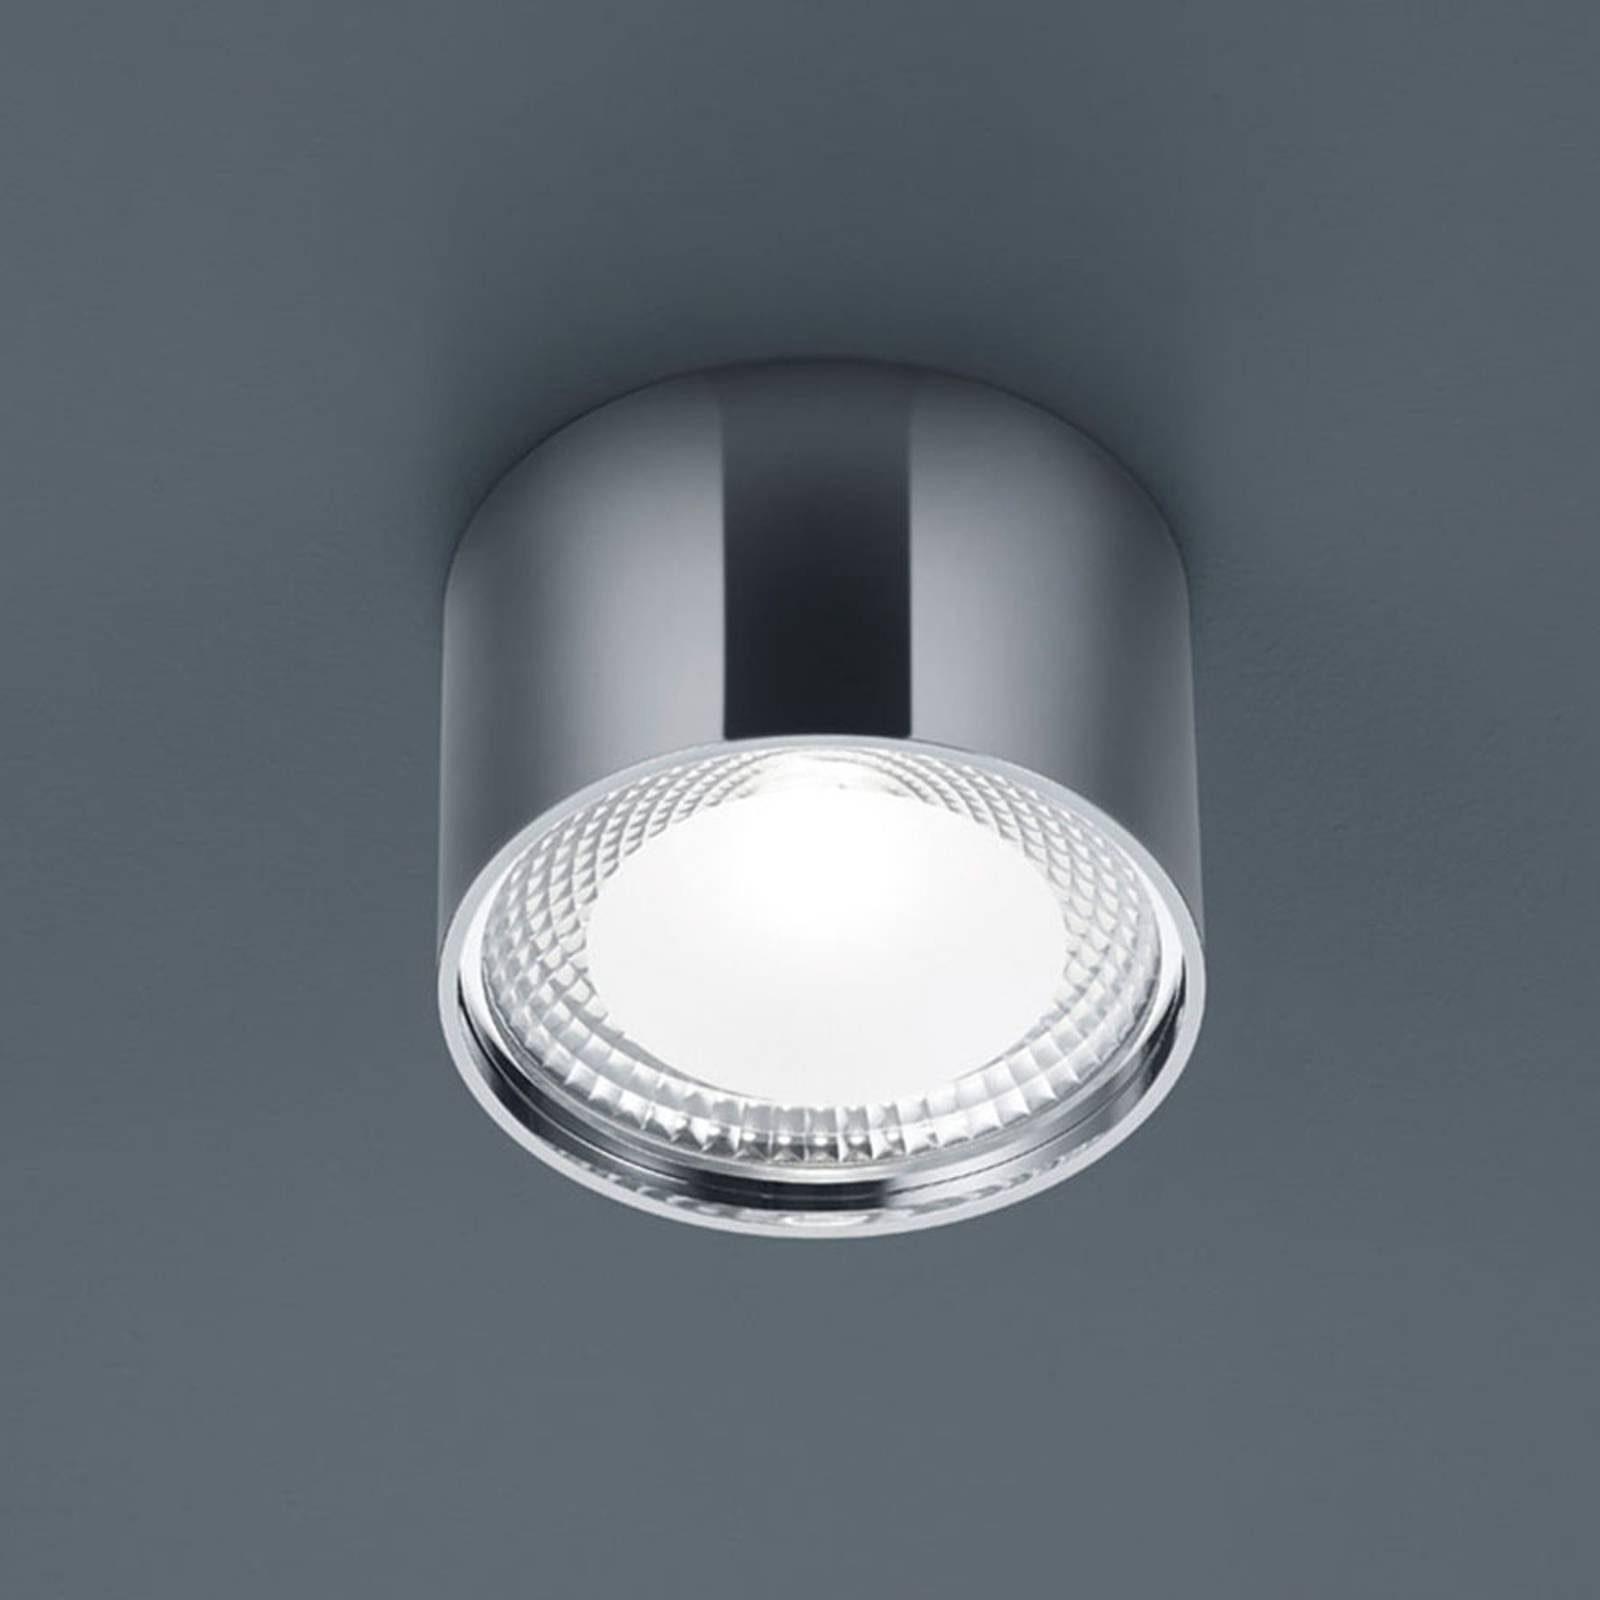 Helestra Kari LED-Deckenleuchte, rund, chrom